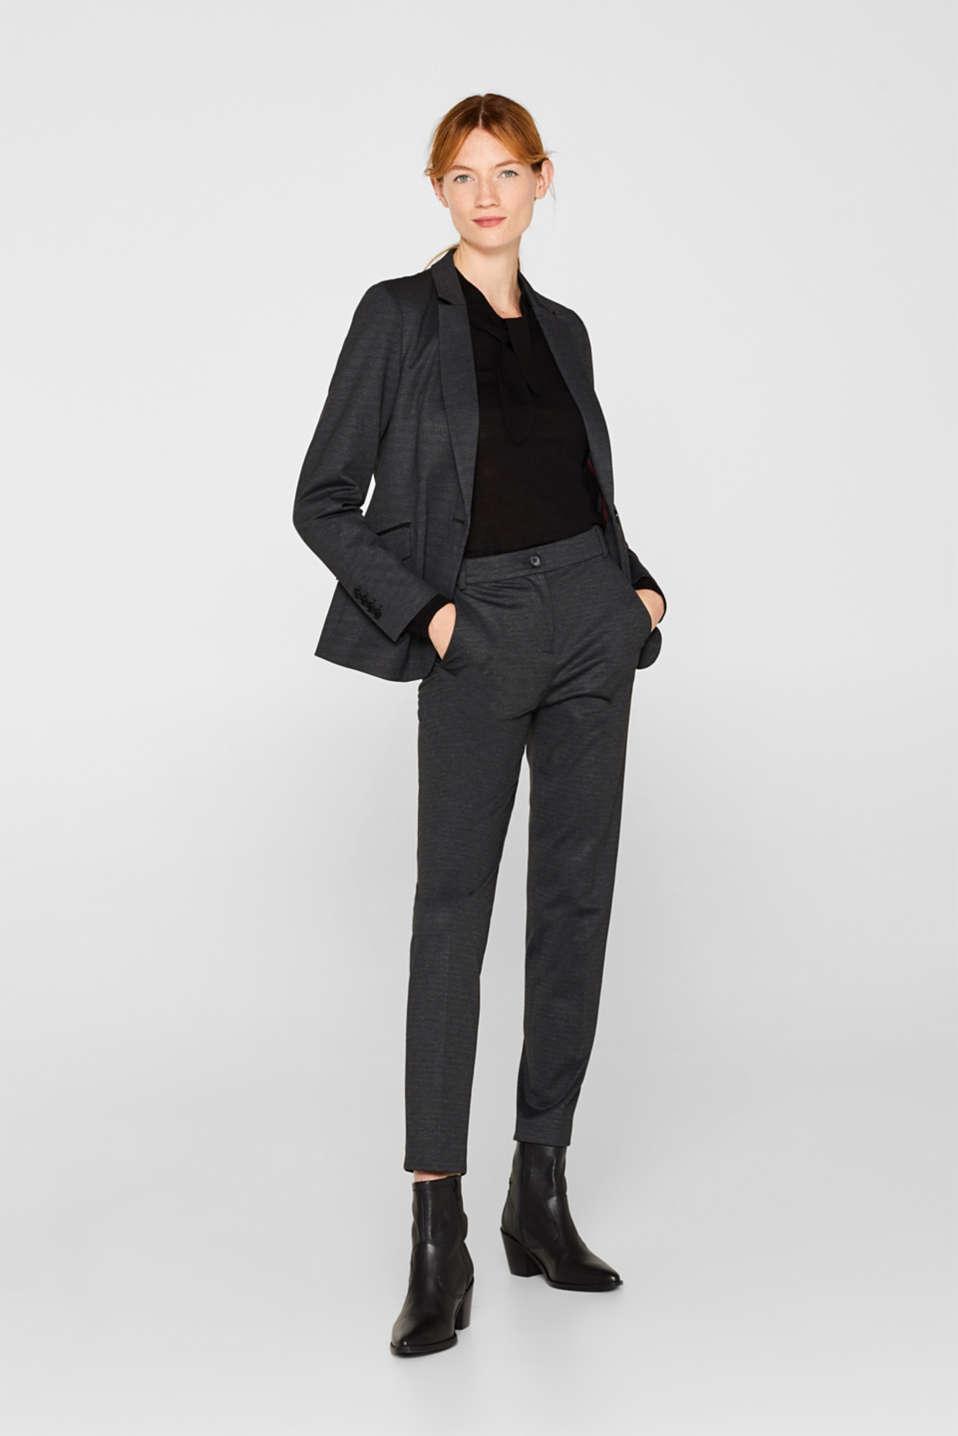 MINI CHECK mix + match stretch blazer, ANTHRACITE, detail image number 1